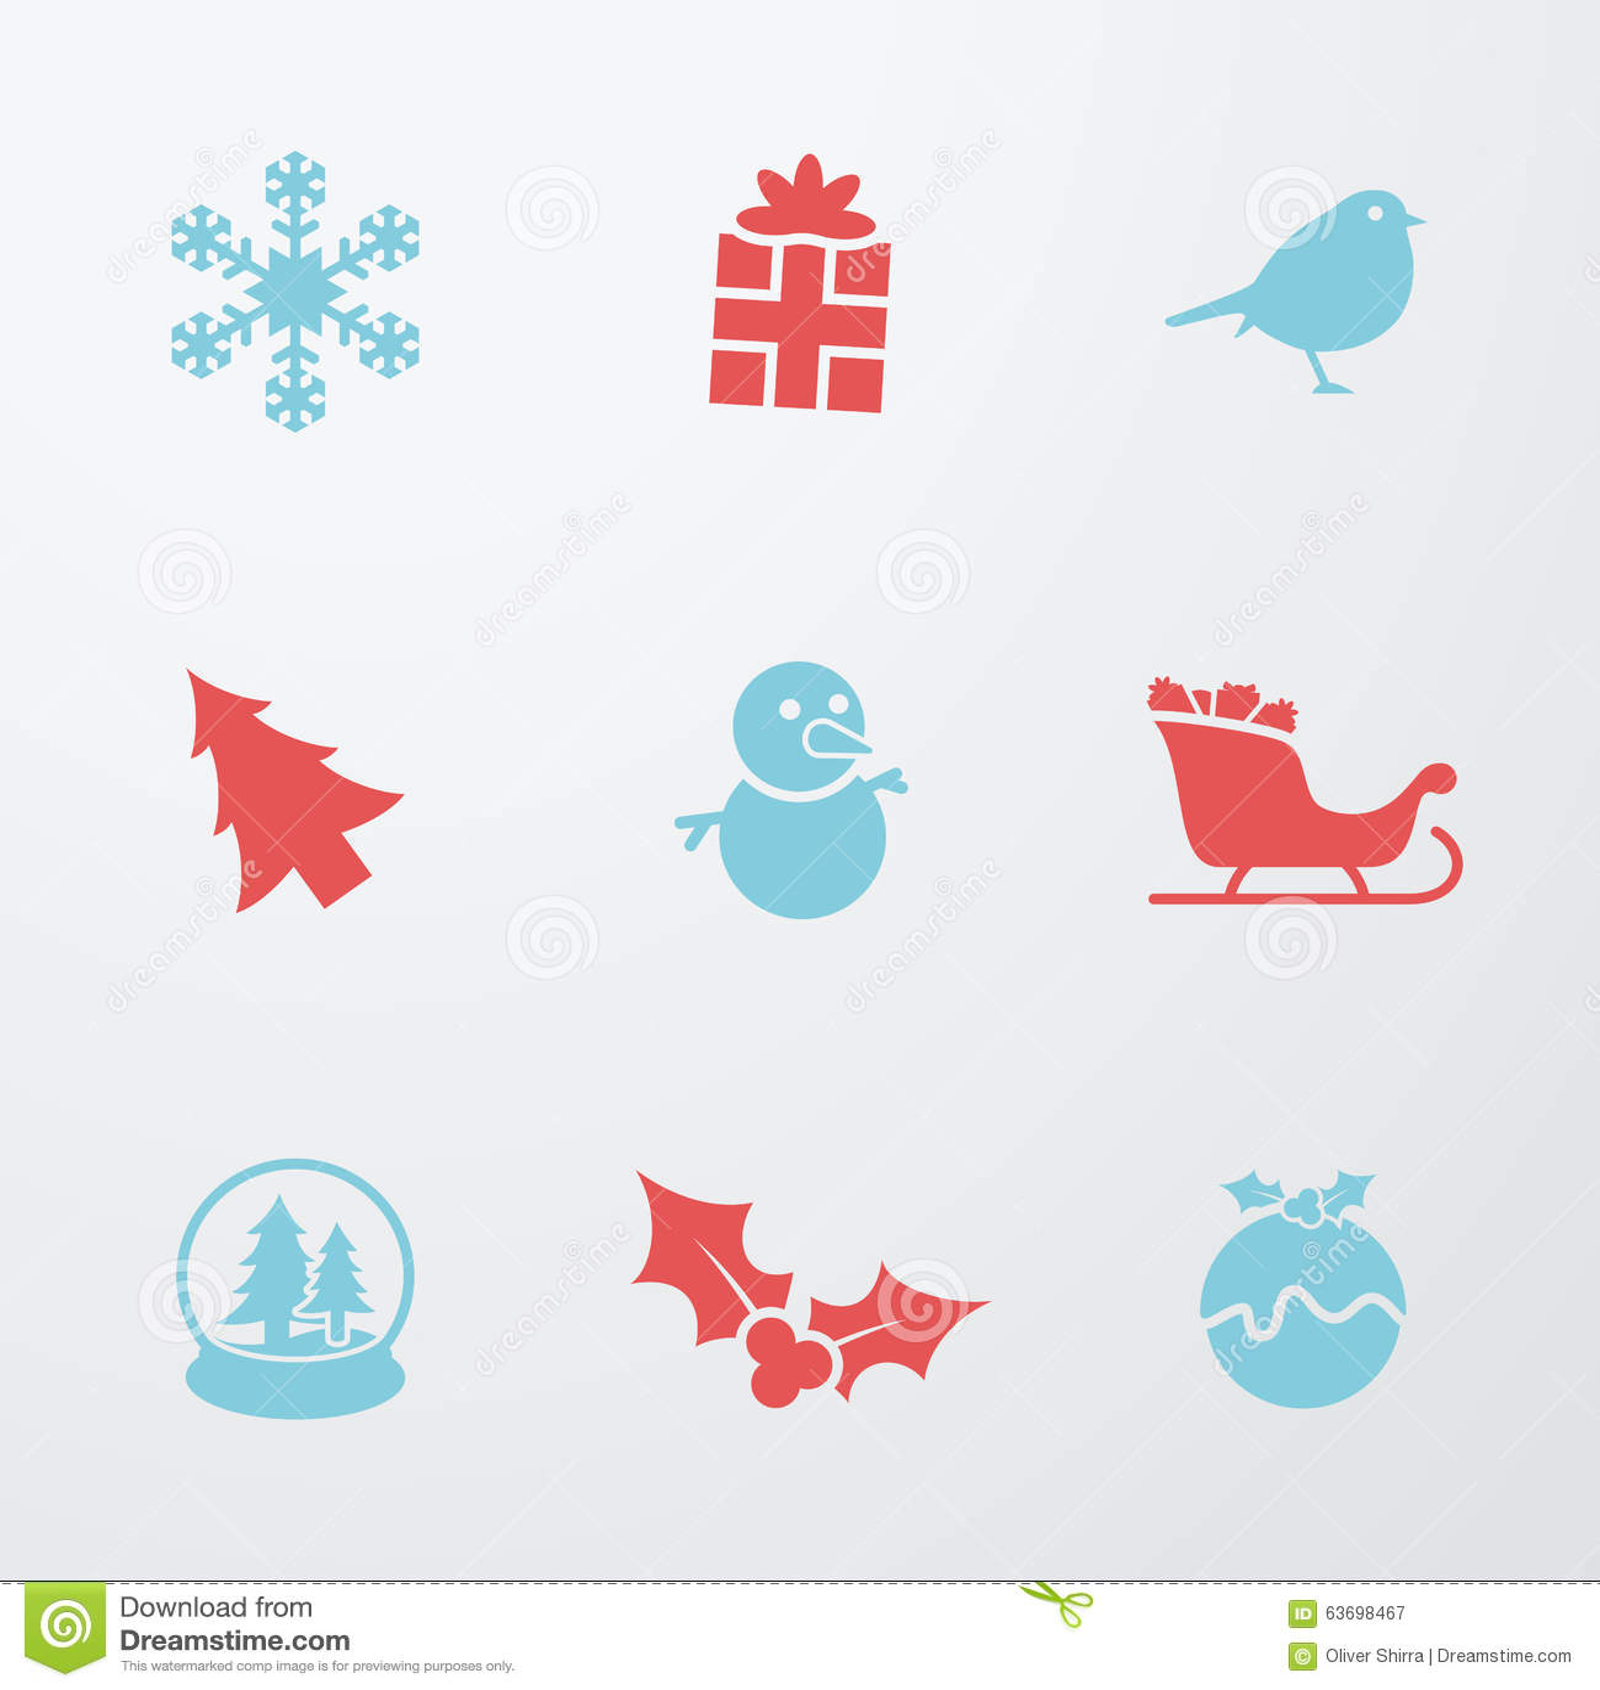 Christmas symbols 9 icons set stock vector illustration of christmas symbols 9 icons set biocorpaavc